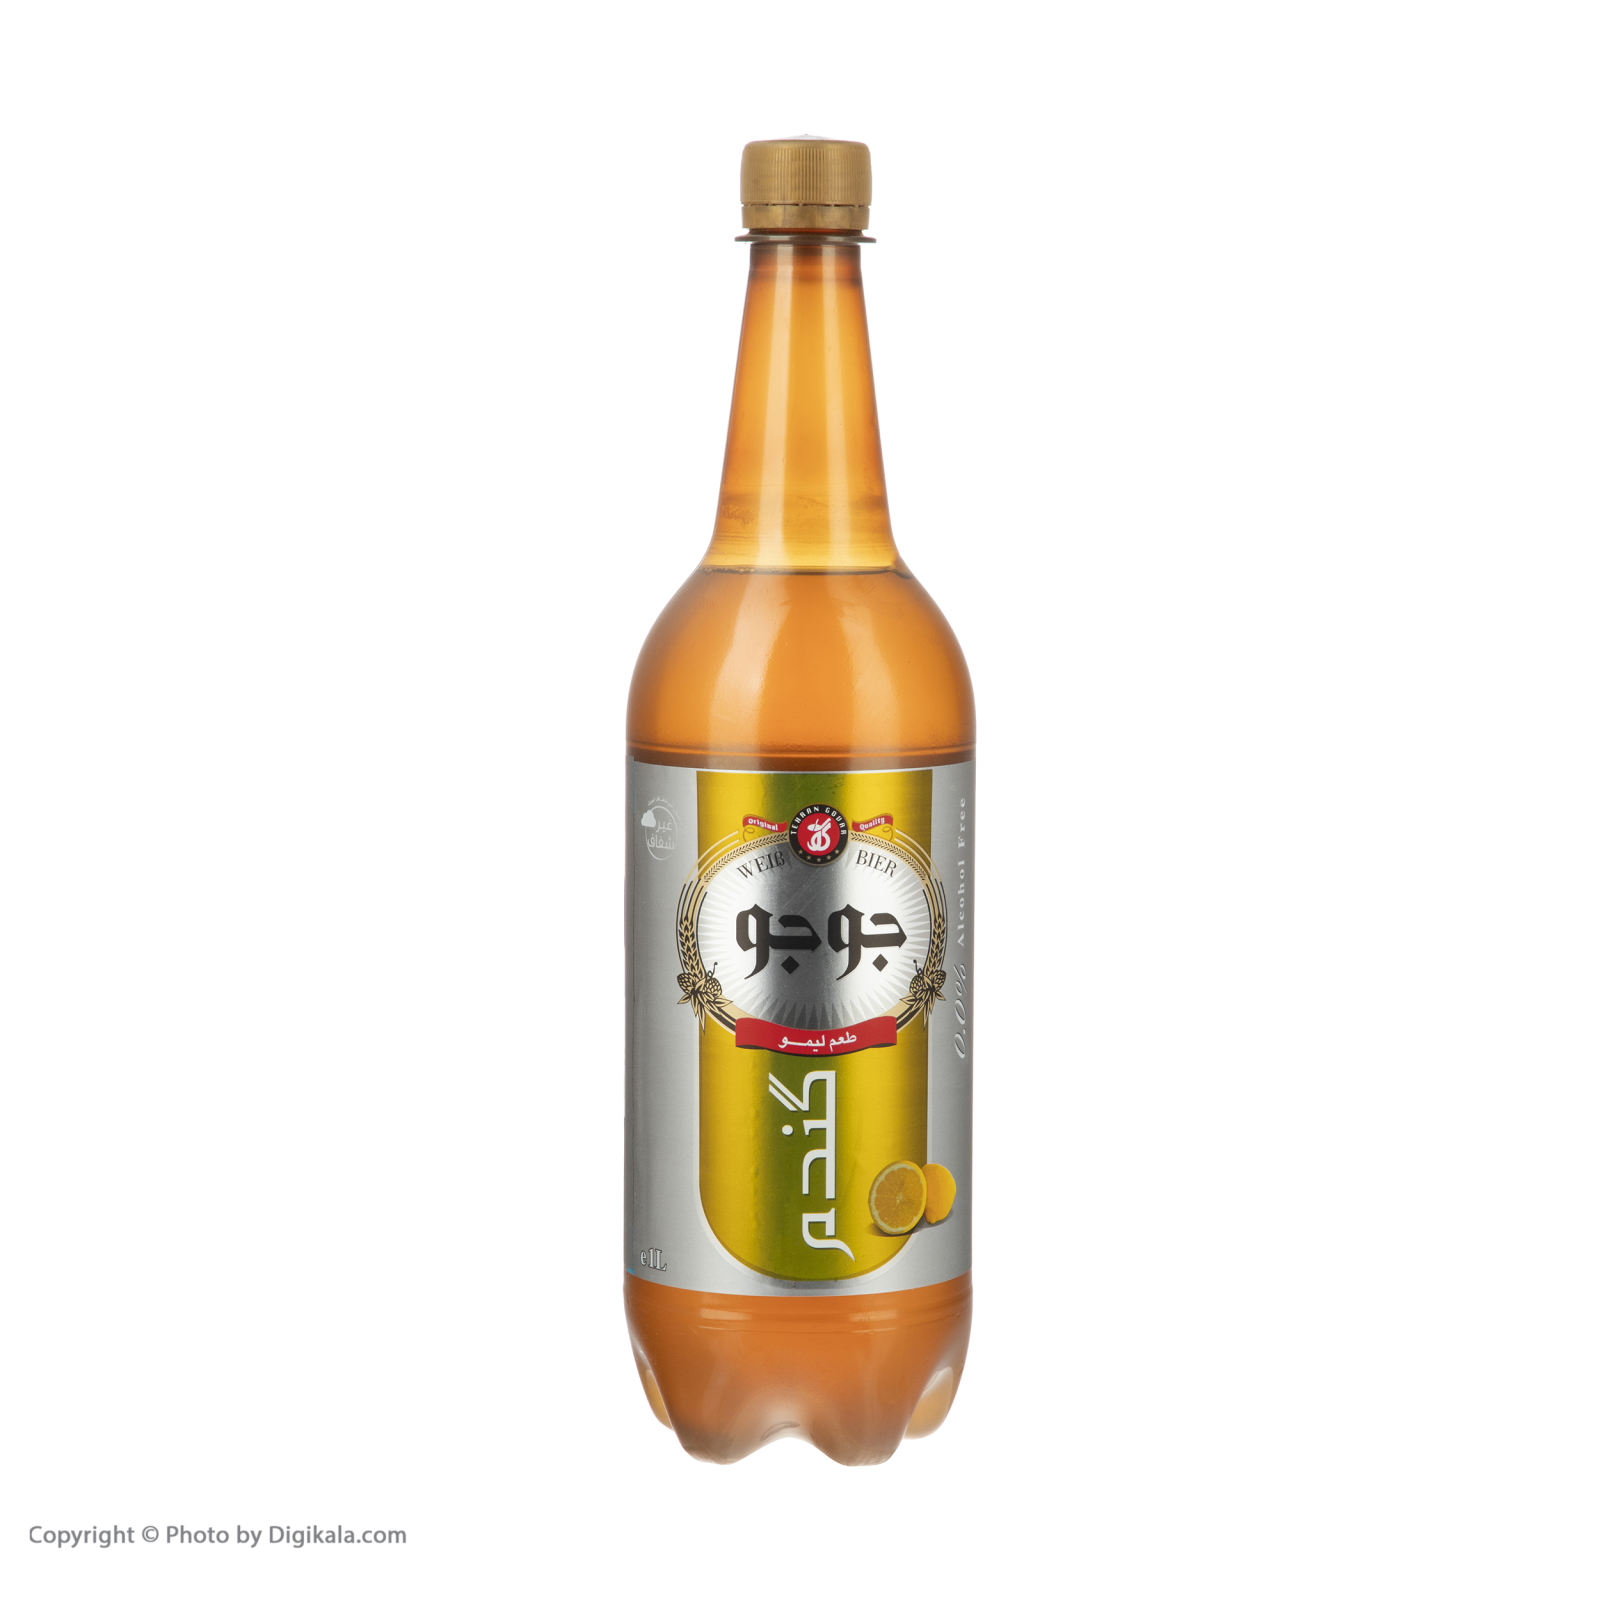 آب گندم جوجو با طعم لیمو - 1 لیتر بسته 6 عددی main 1 1